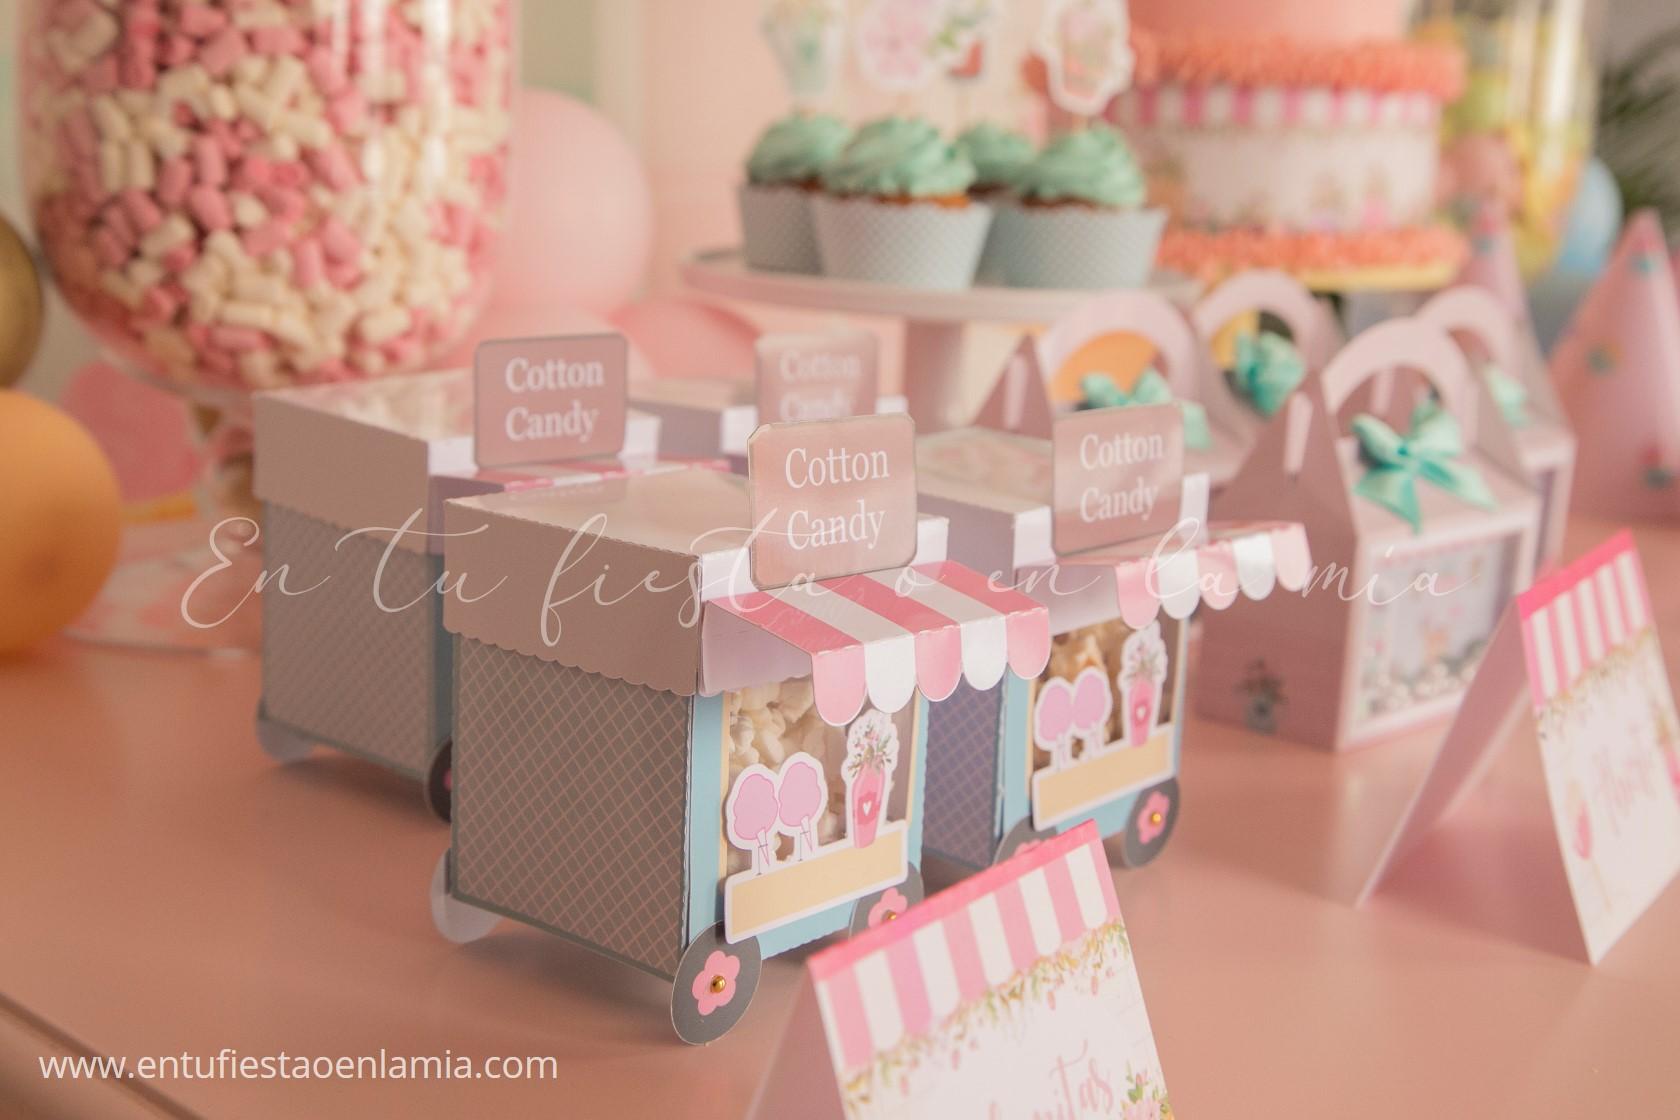 fiesta-segura-pasteleria-papeleria-de-lujo